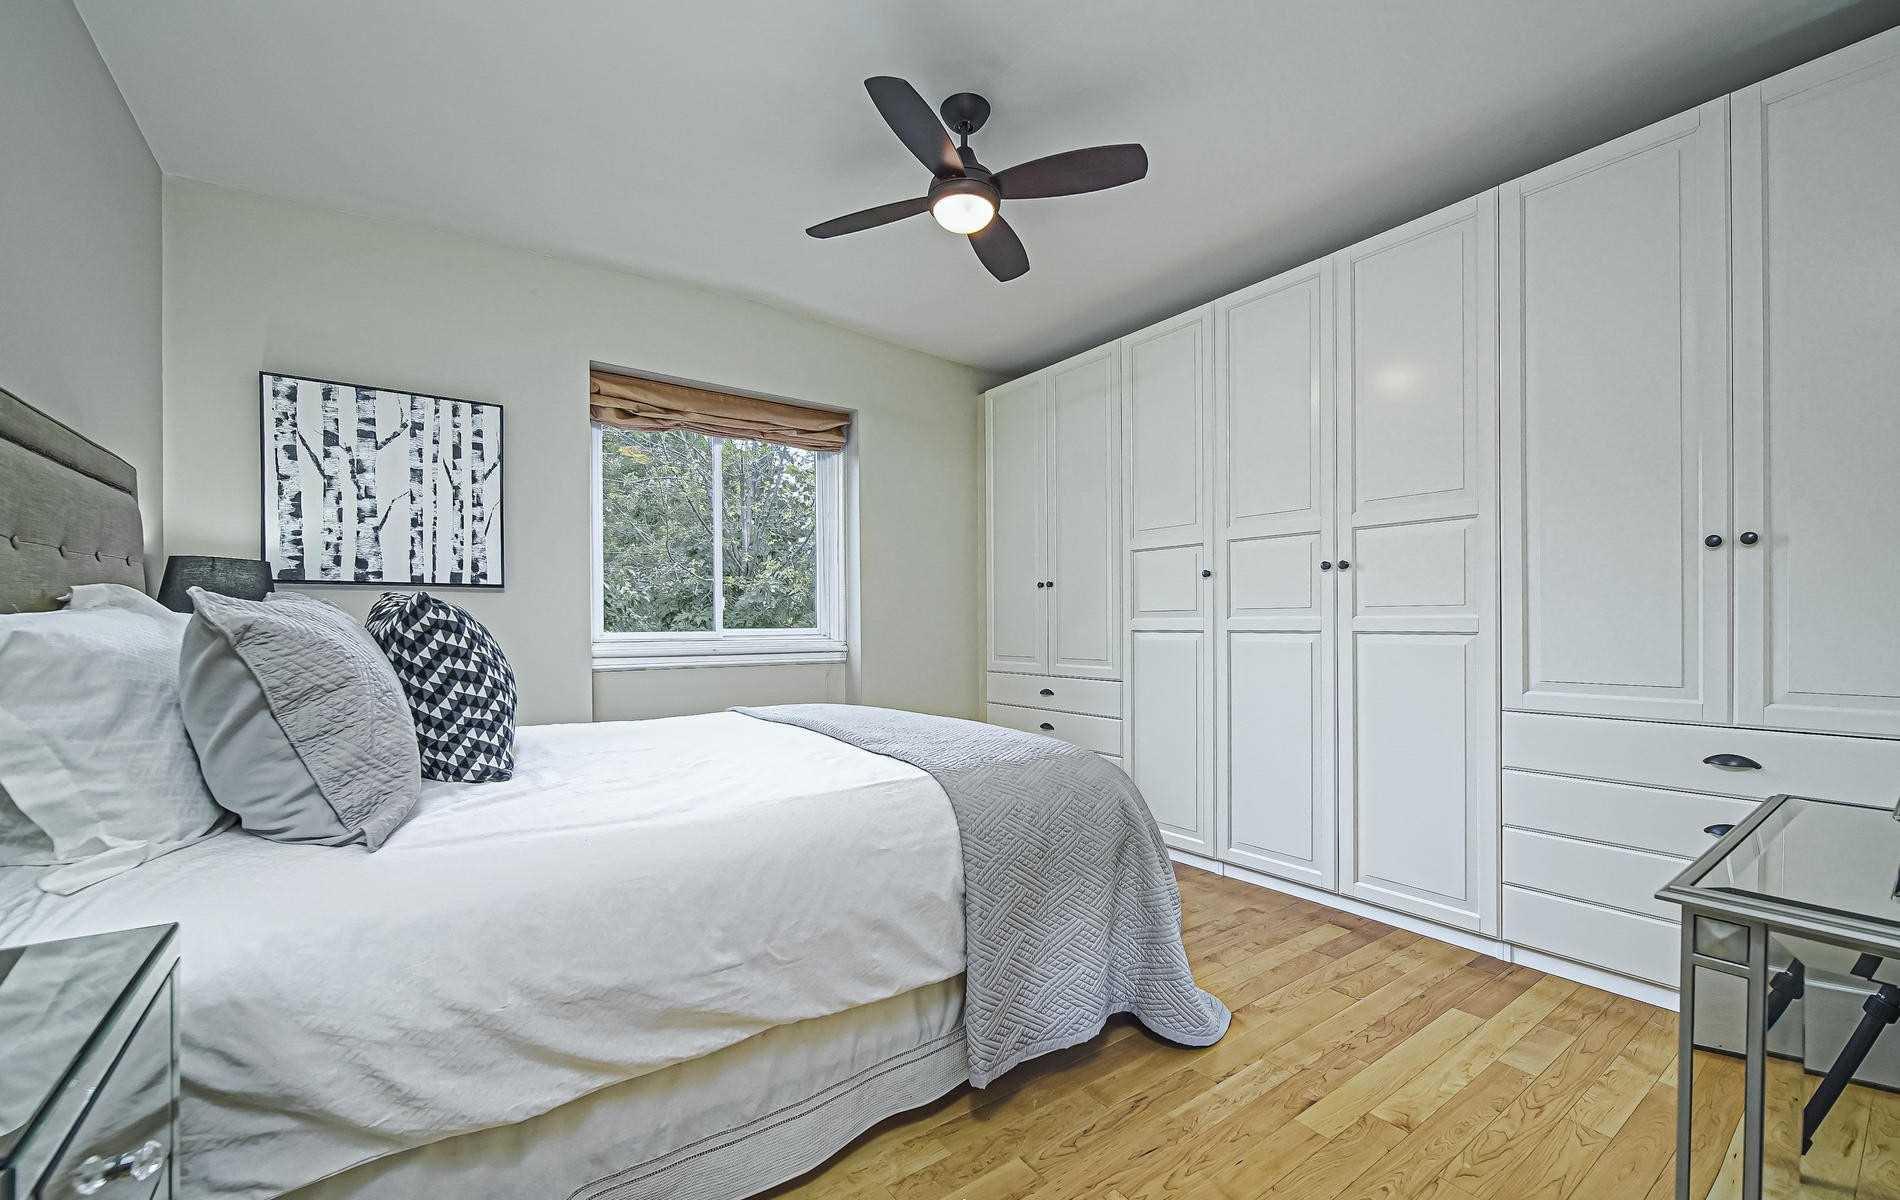 Photo 10: Photos: 84 Rushbrooke Avenue in Toronto: South Riverdale House (2-Storey) for sale (Toronto E01)  : MLS®# E4600791